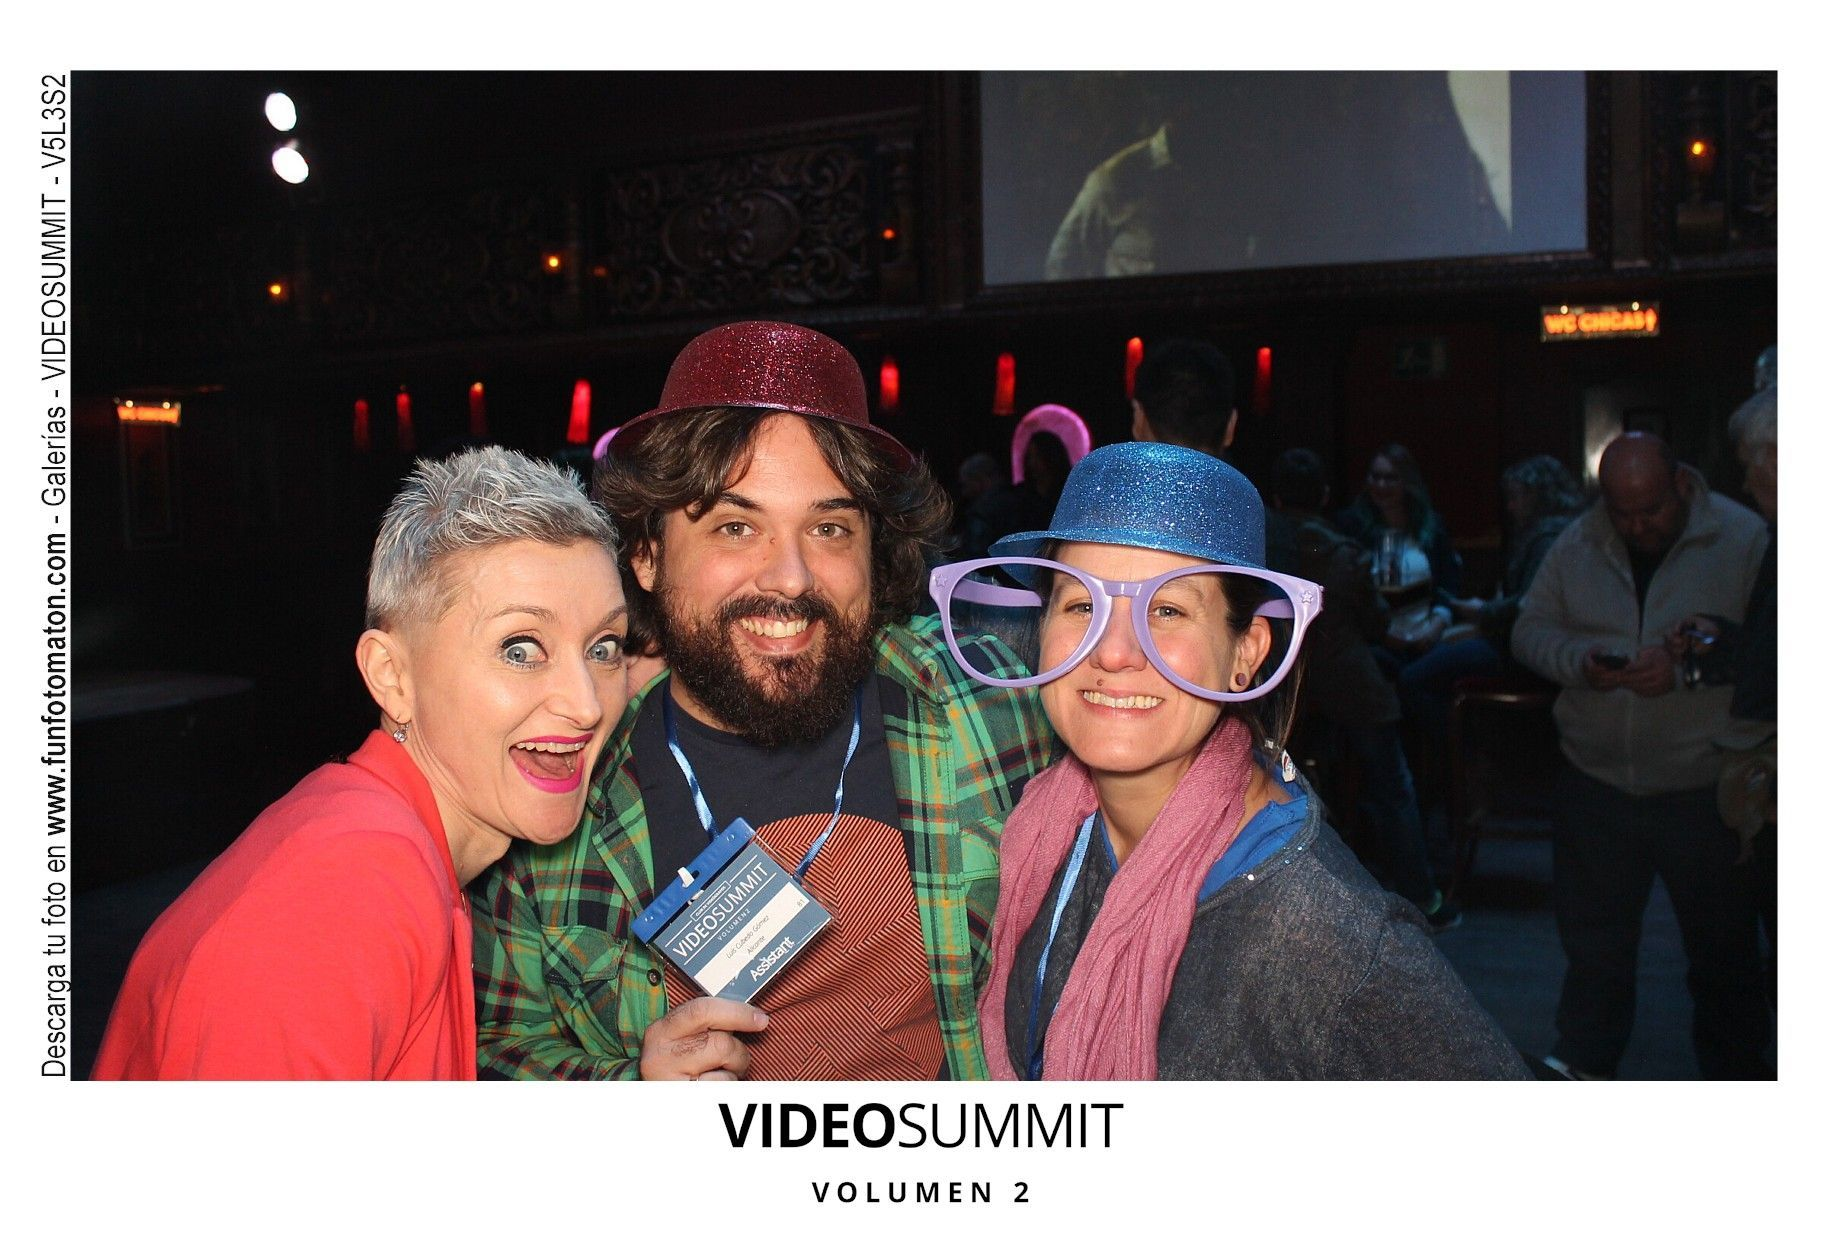 videosummit-vol2-club-party-058